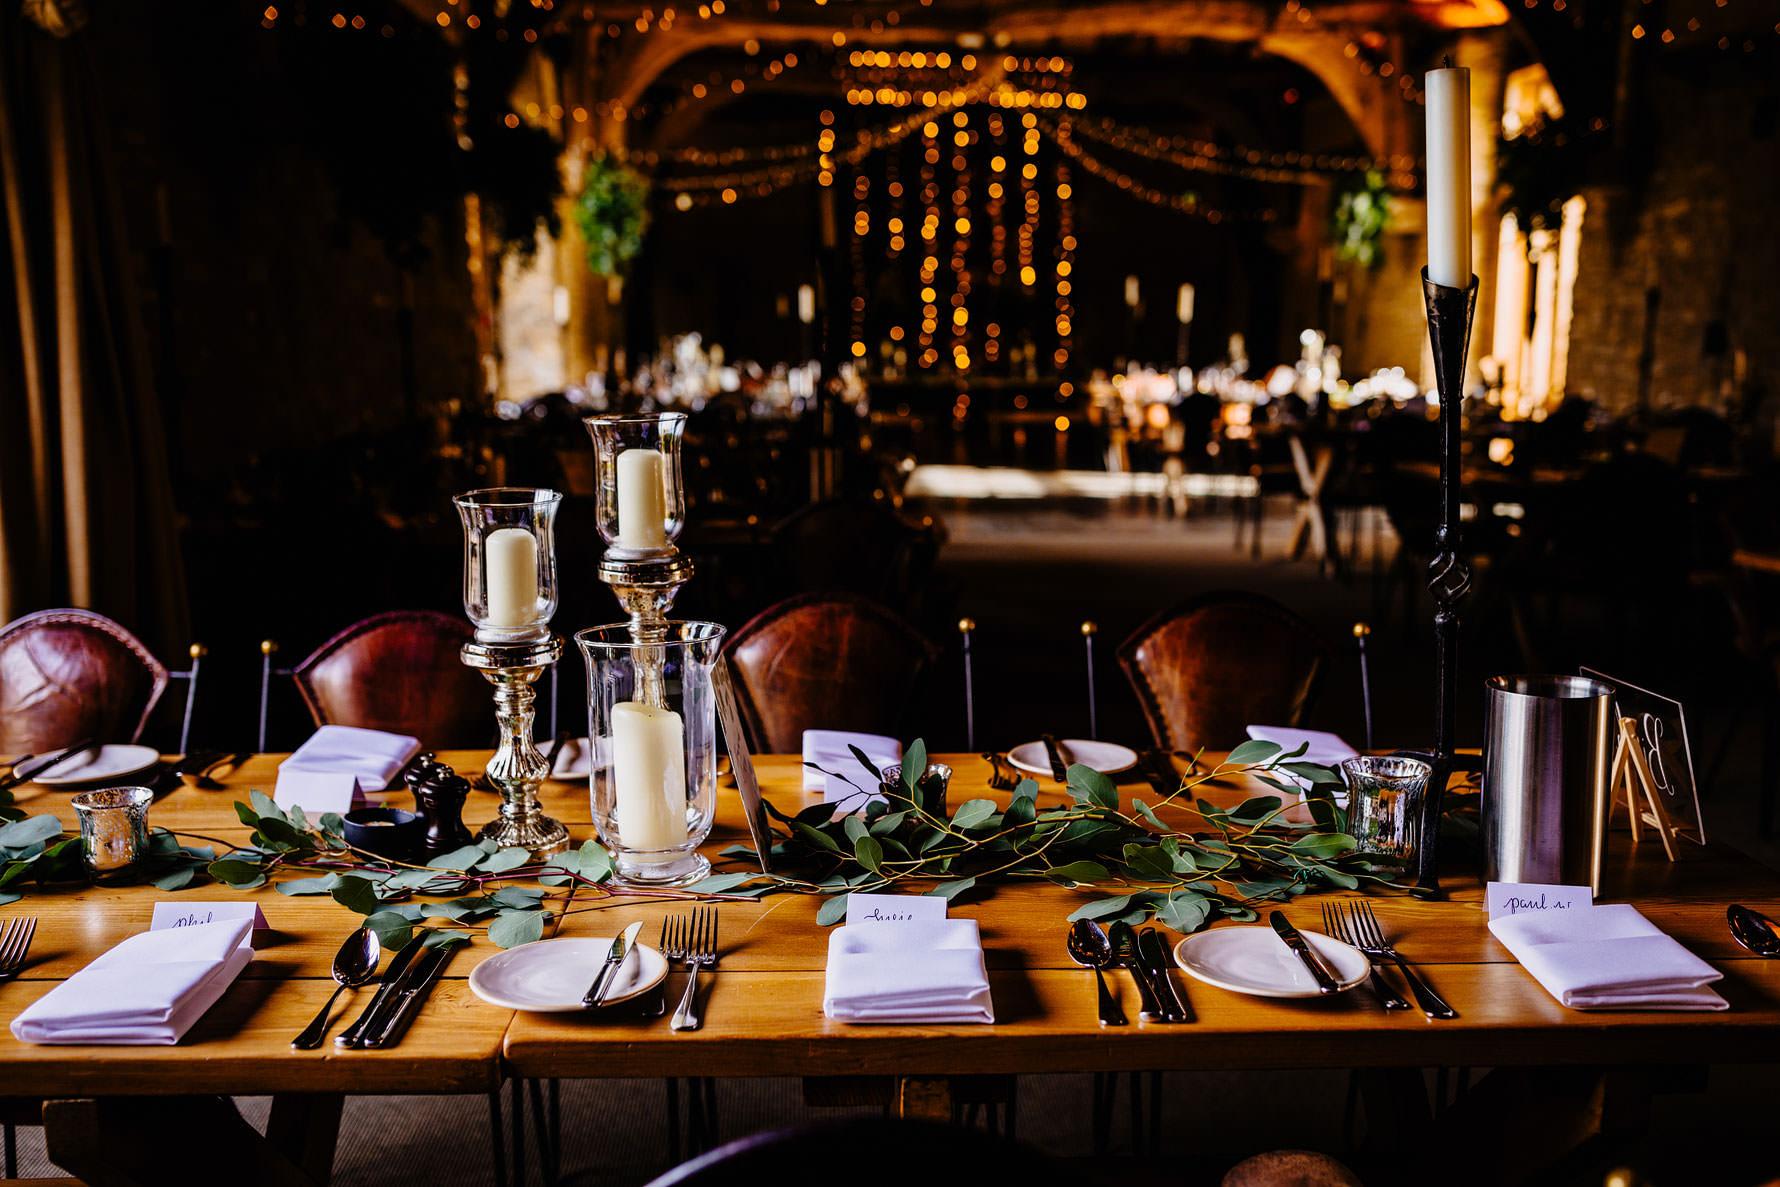 a room ready for a wedding breakfast